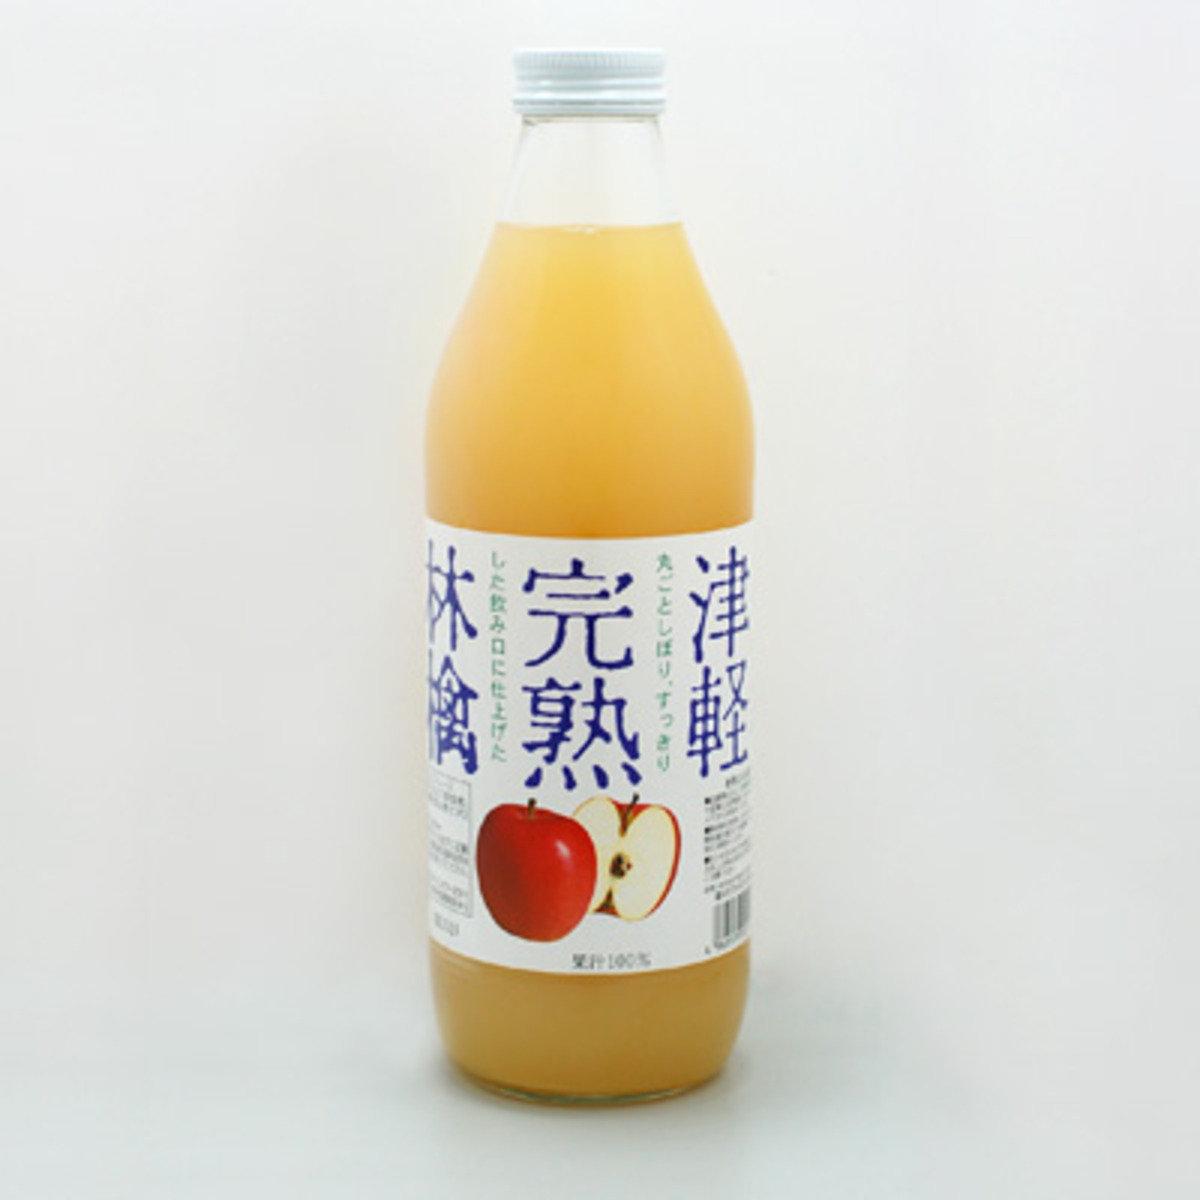 Sterling 津輕完熟林檎100%蘋果汁 1公升